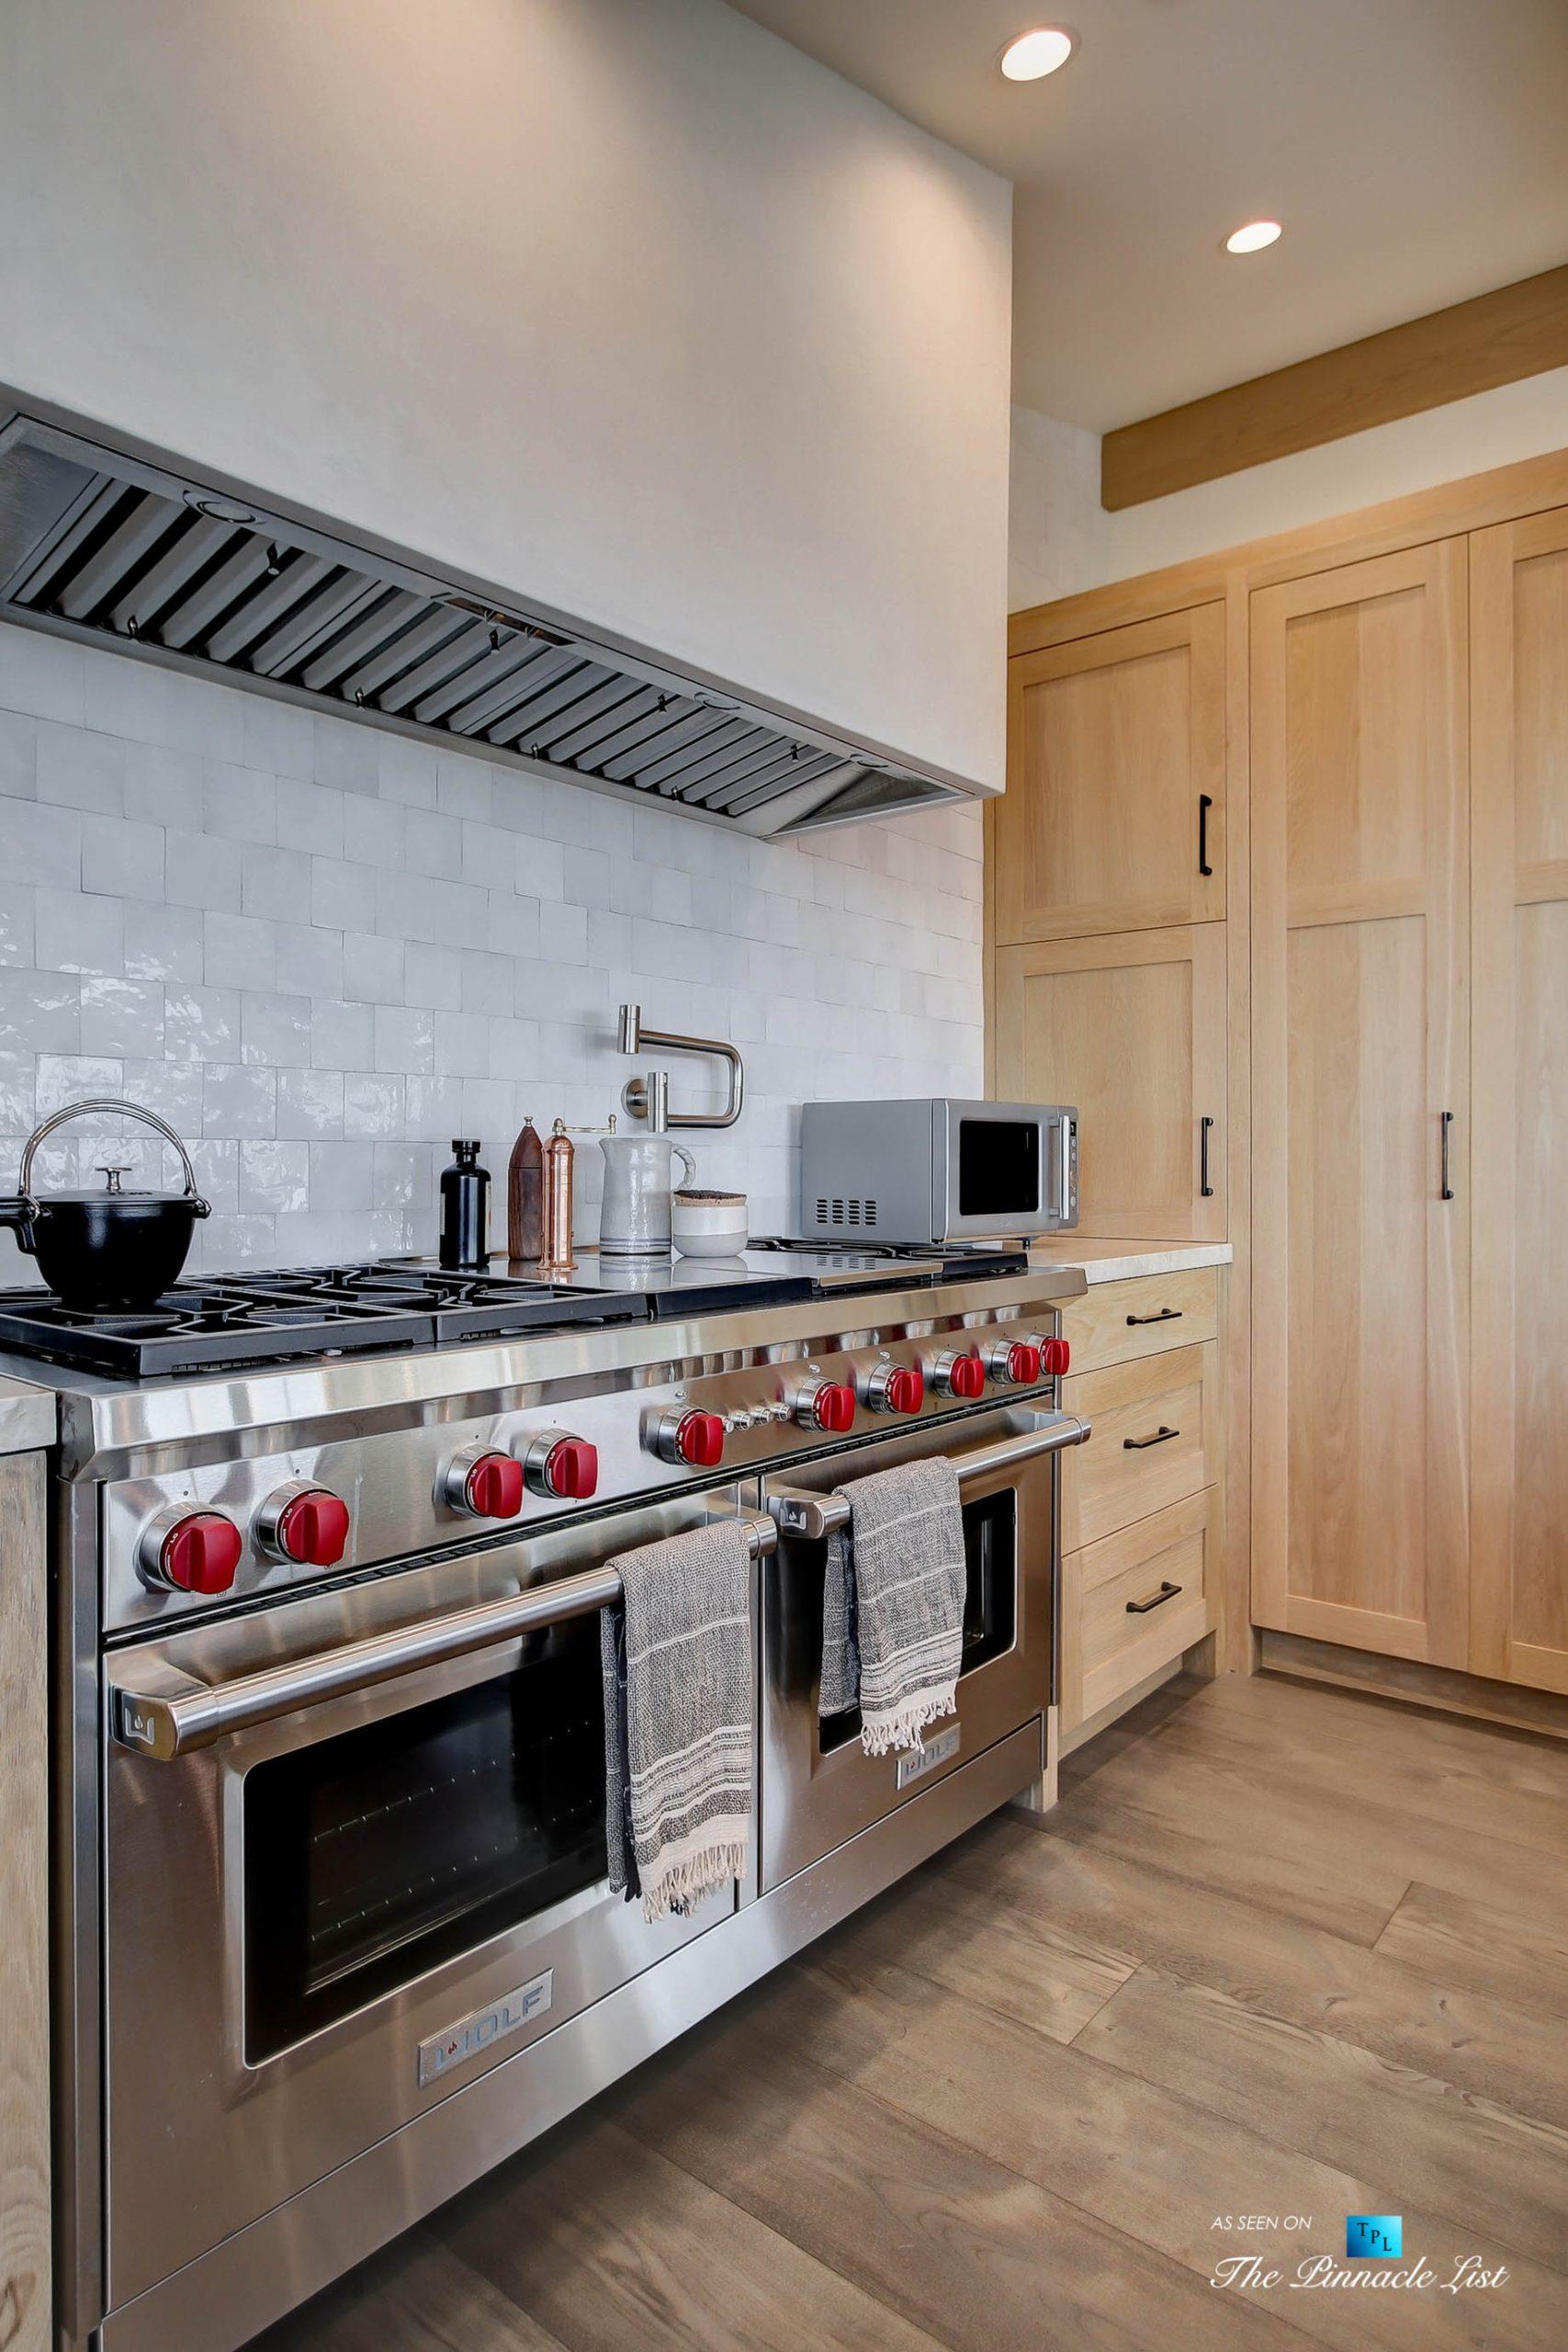 825 Highview Ave, Manhattan Beach, CA, USA - Kitchen WOLF Gas Range and Hood - Luxury Real Estate - Modern Spanish Home